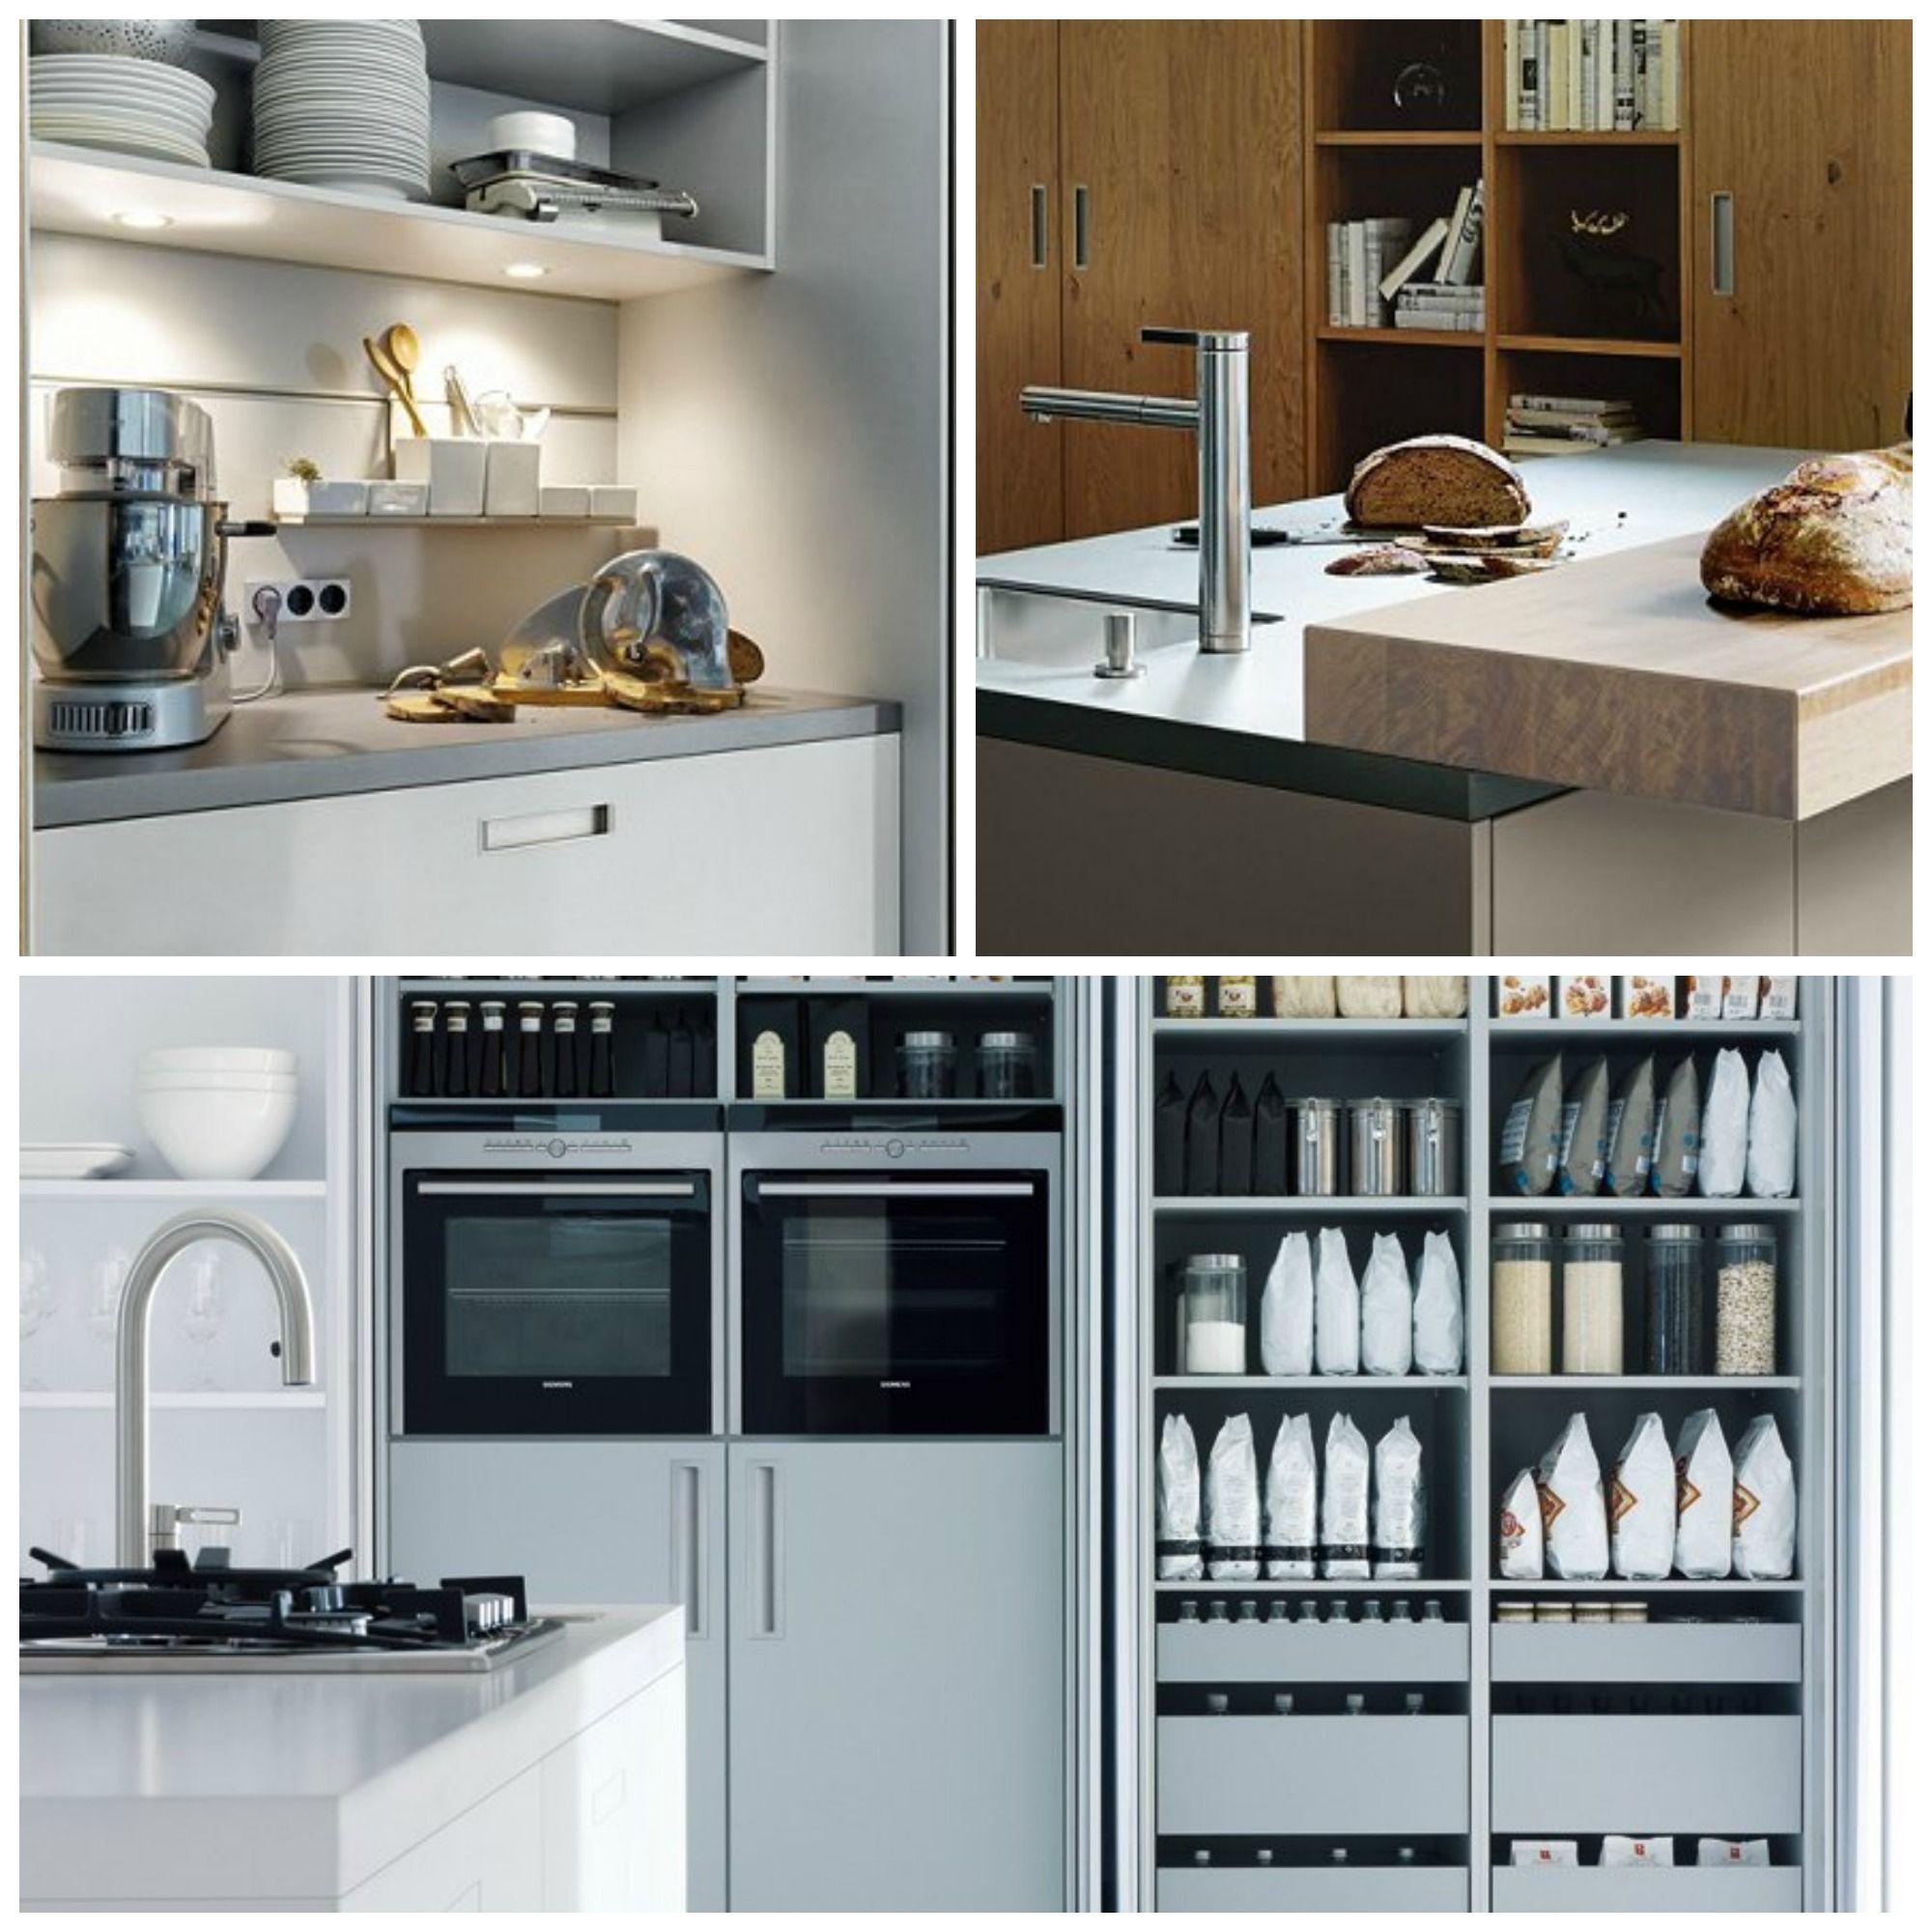 Modern Minimalist Kitchen Cabinets: Create A Minimalist Kitchen With Modern Storage From